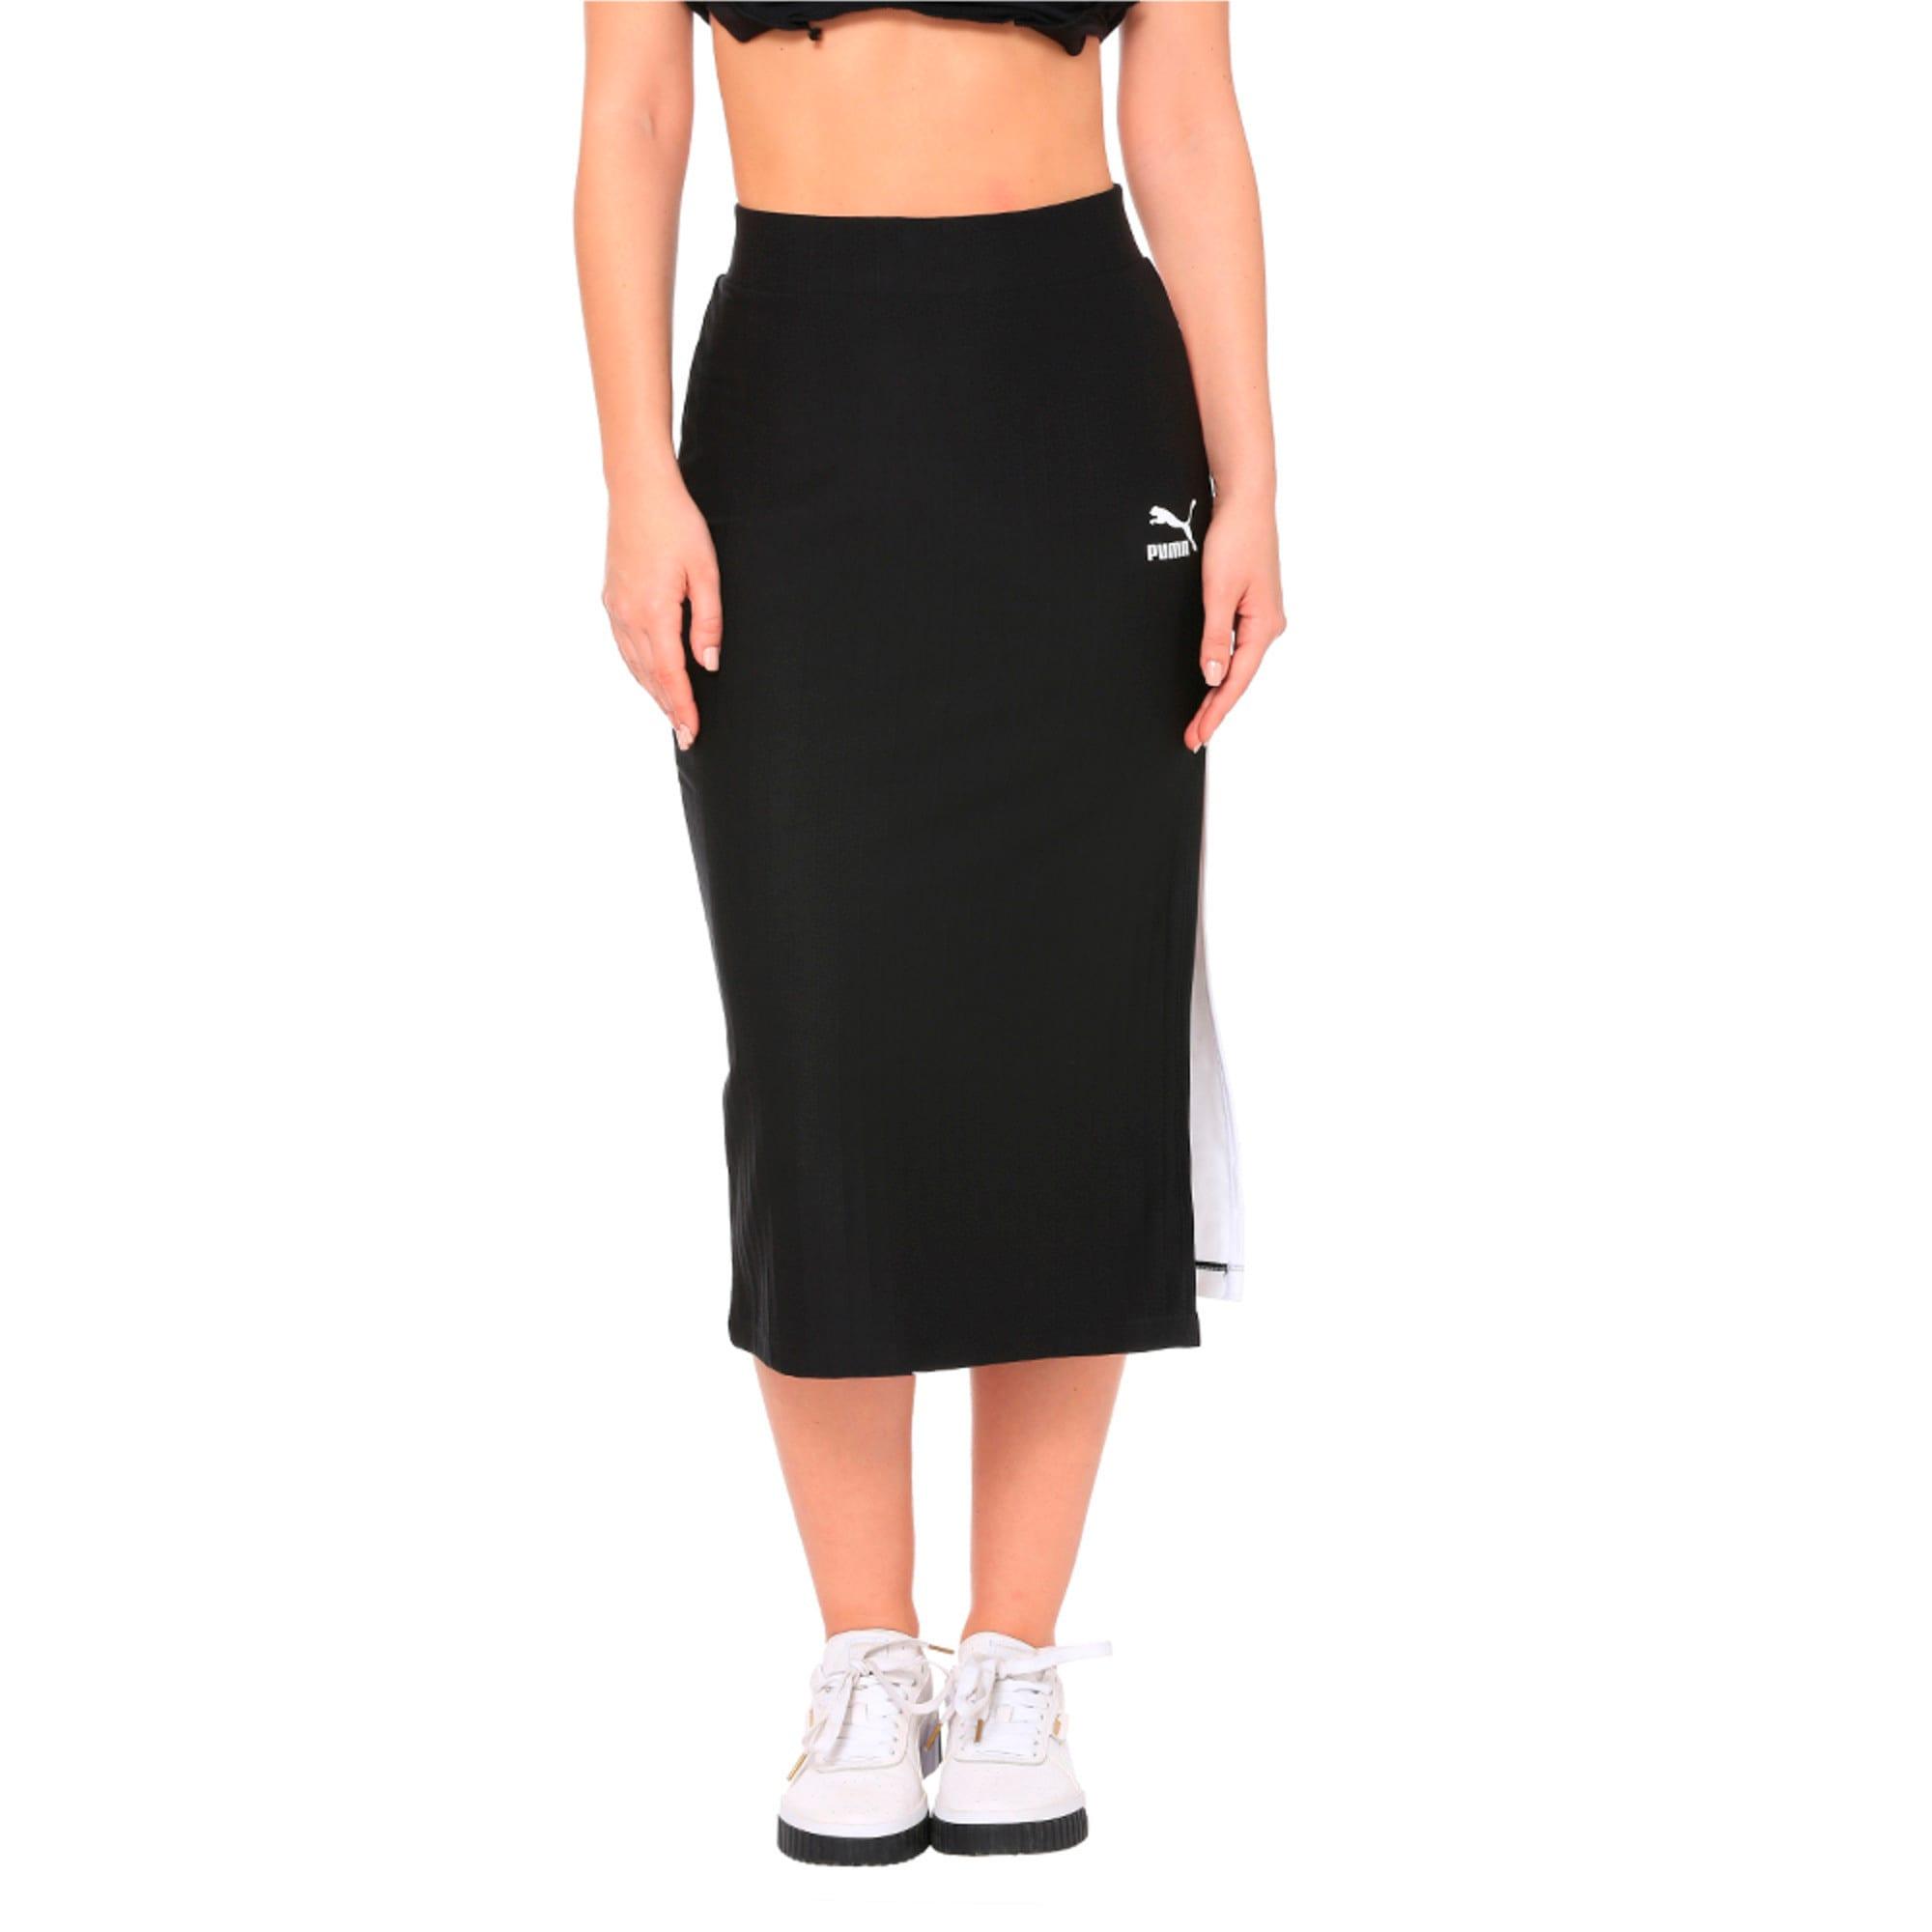 Thumbnail 1 of Classics Women's Skirt, Puma Black, medium-IND